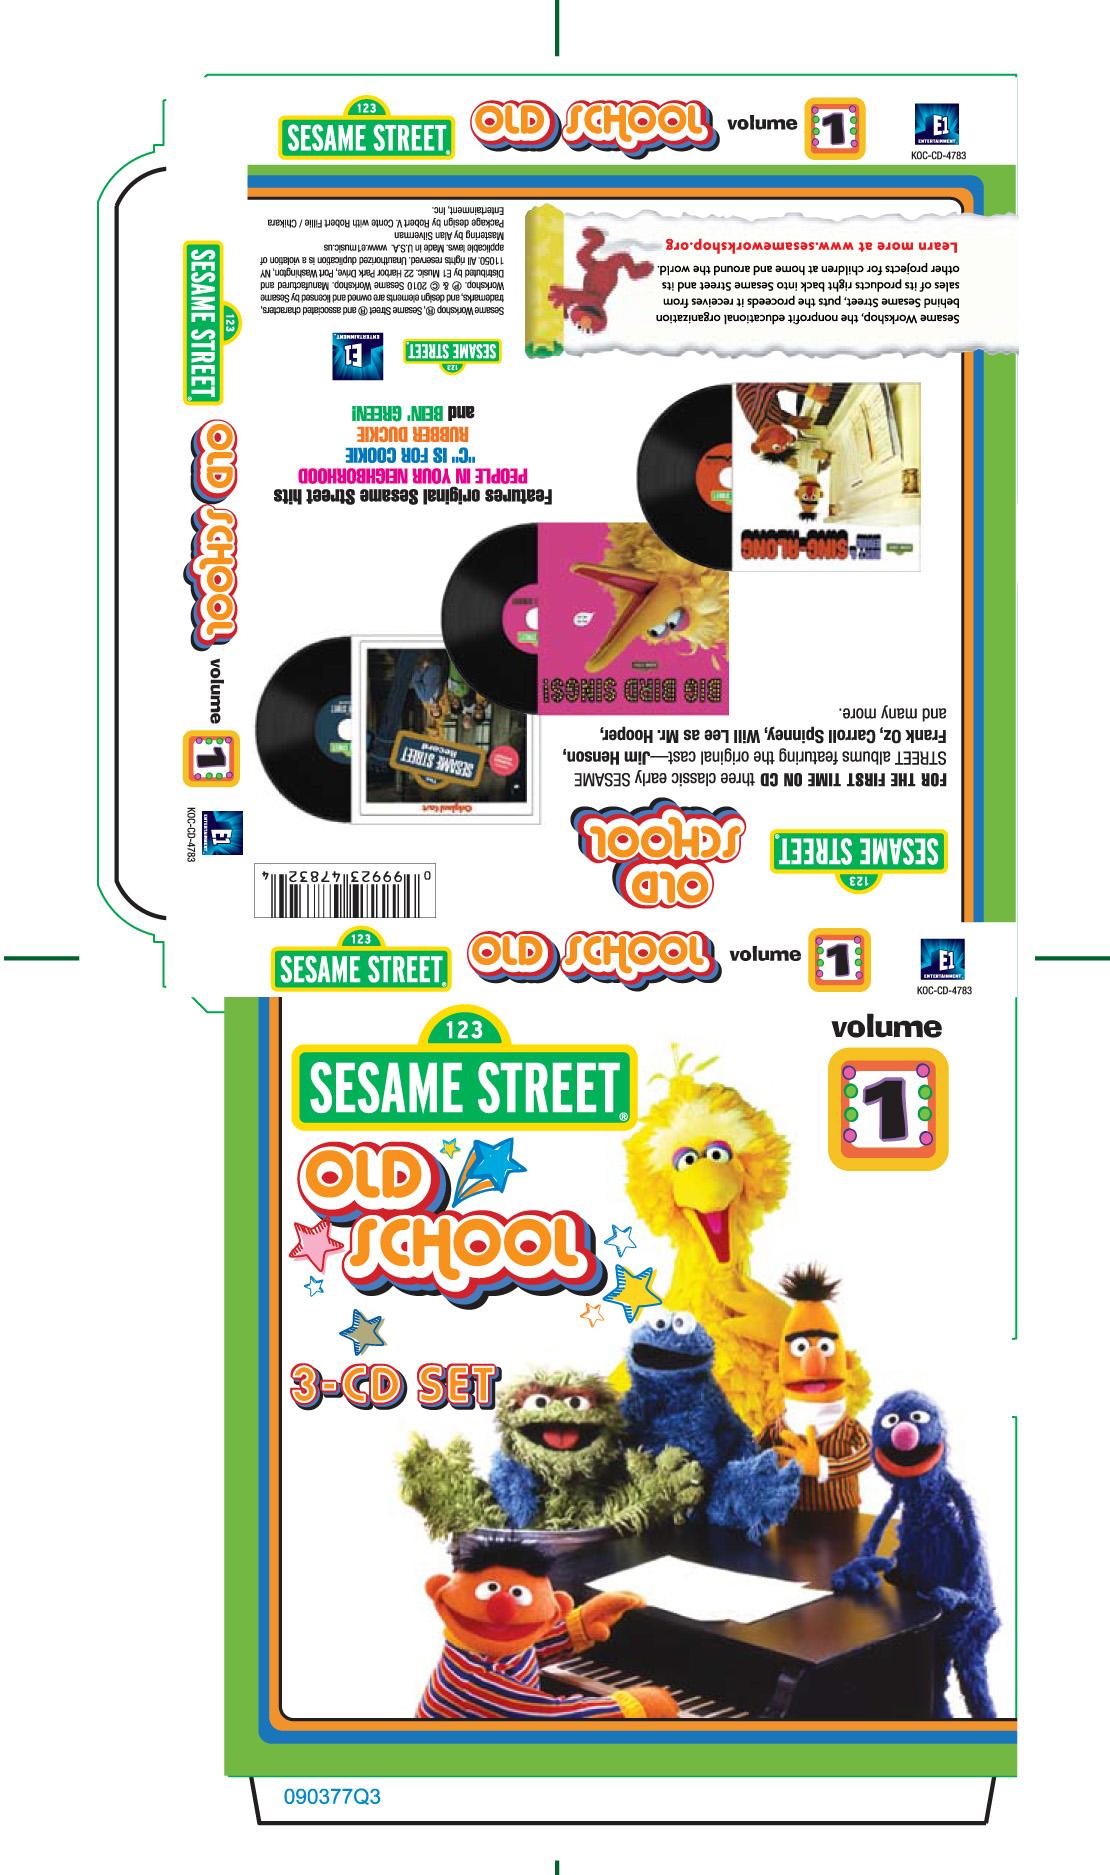 SesameSt_BoxSet_V3-1.jpg